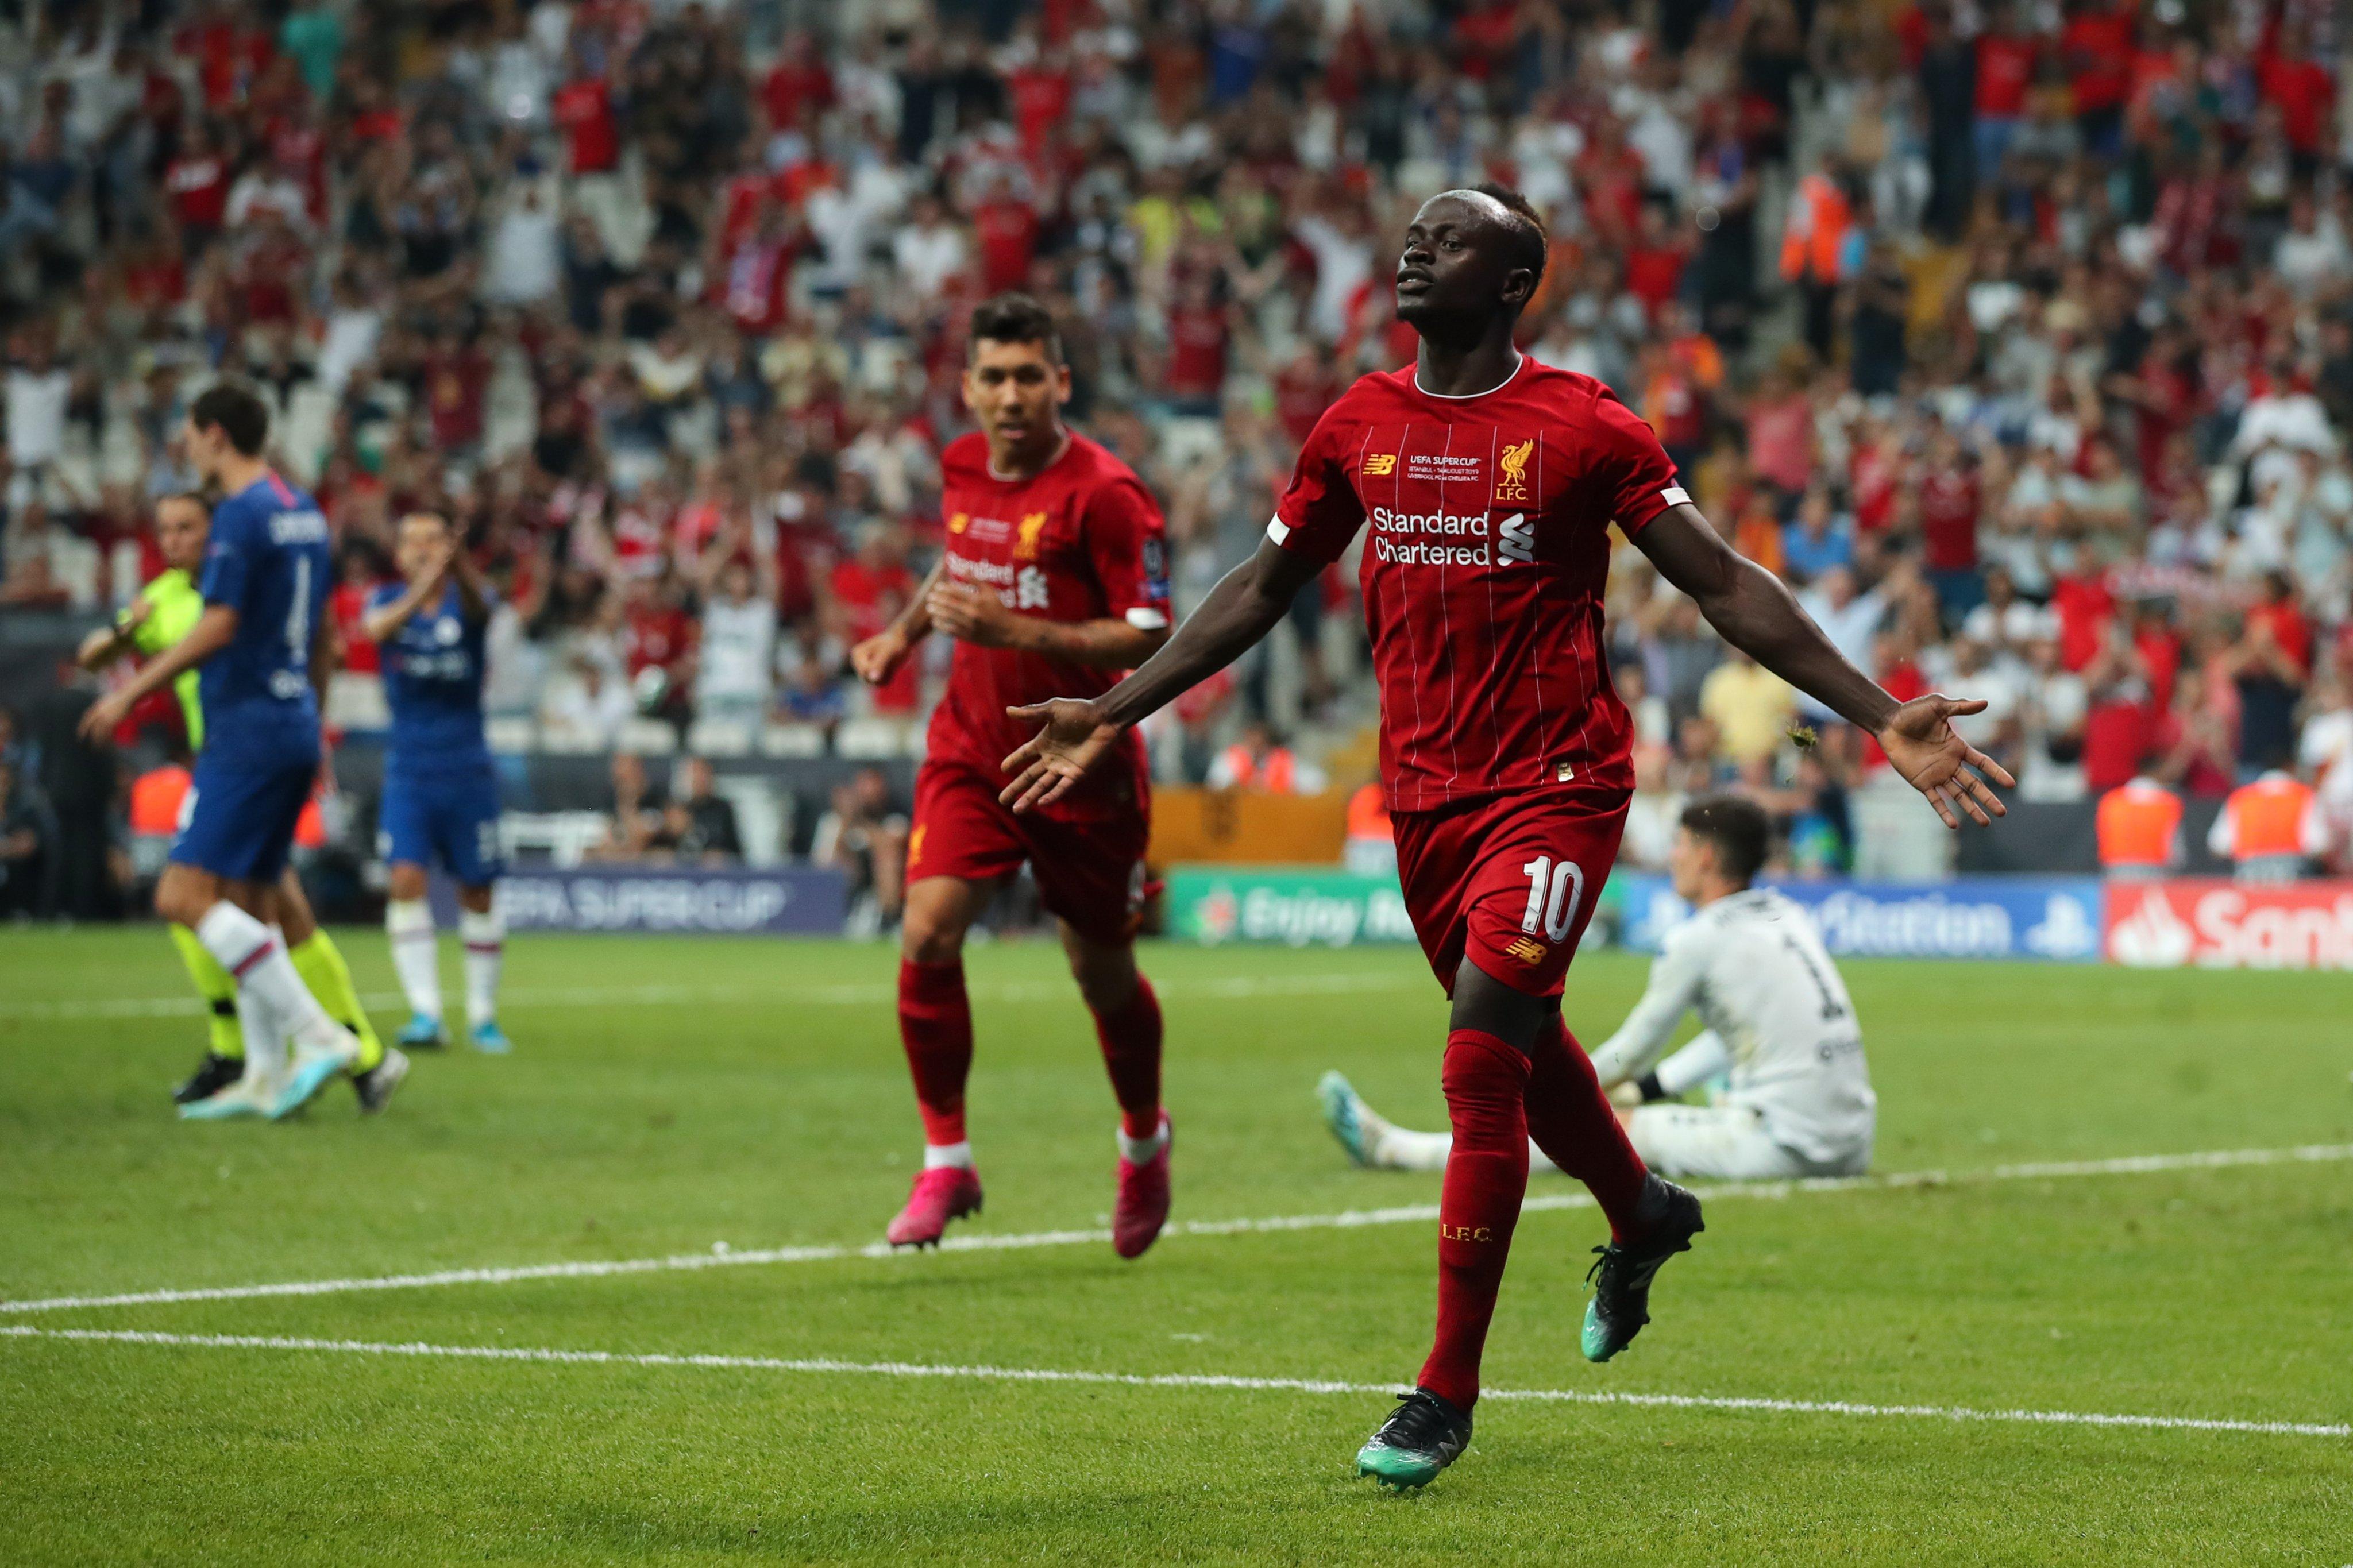 Premier League-Senegal-Liverpool-England-انگلیس-سنگال-لیگ برتر-لیورپول